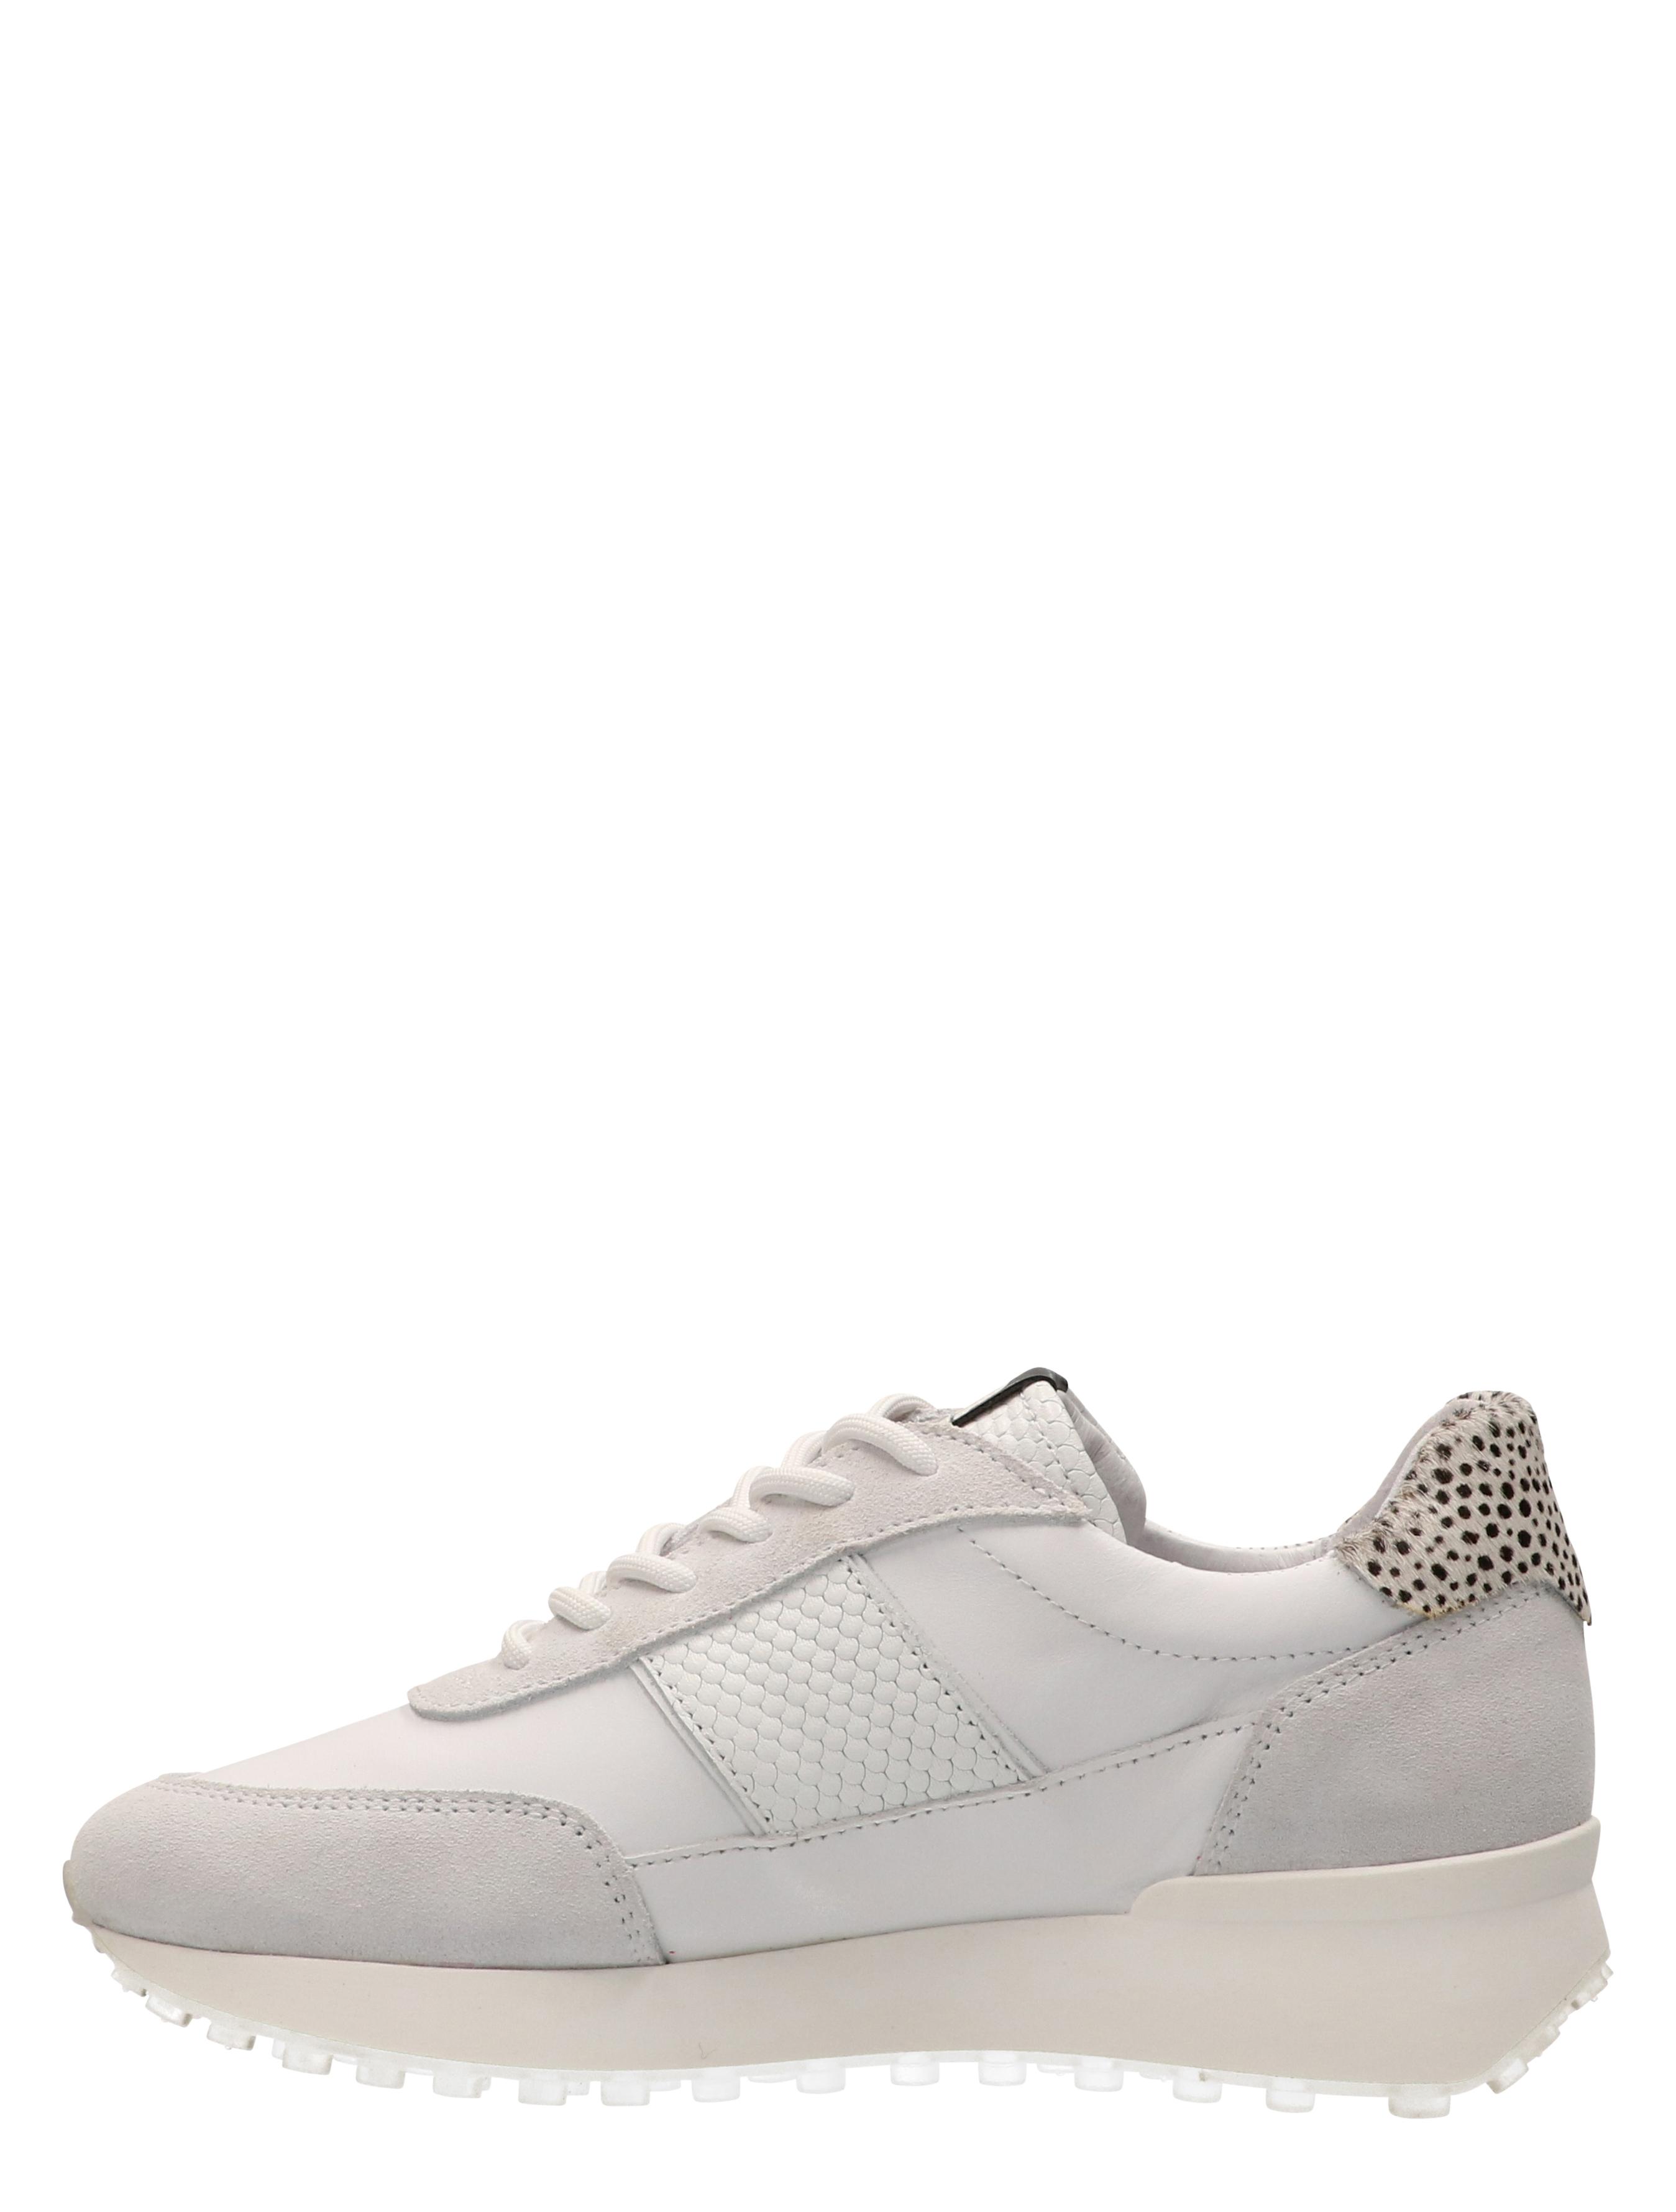 Maruti Lois White Combi Sneakers